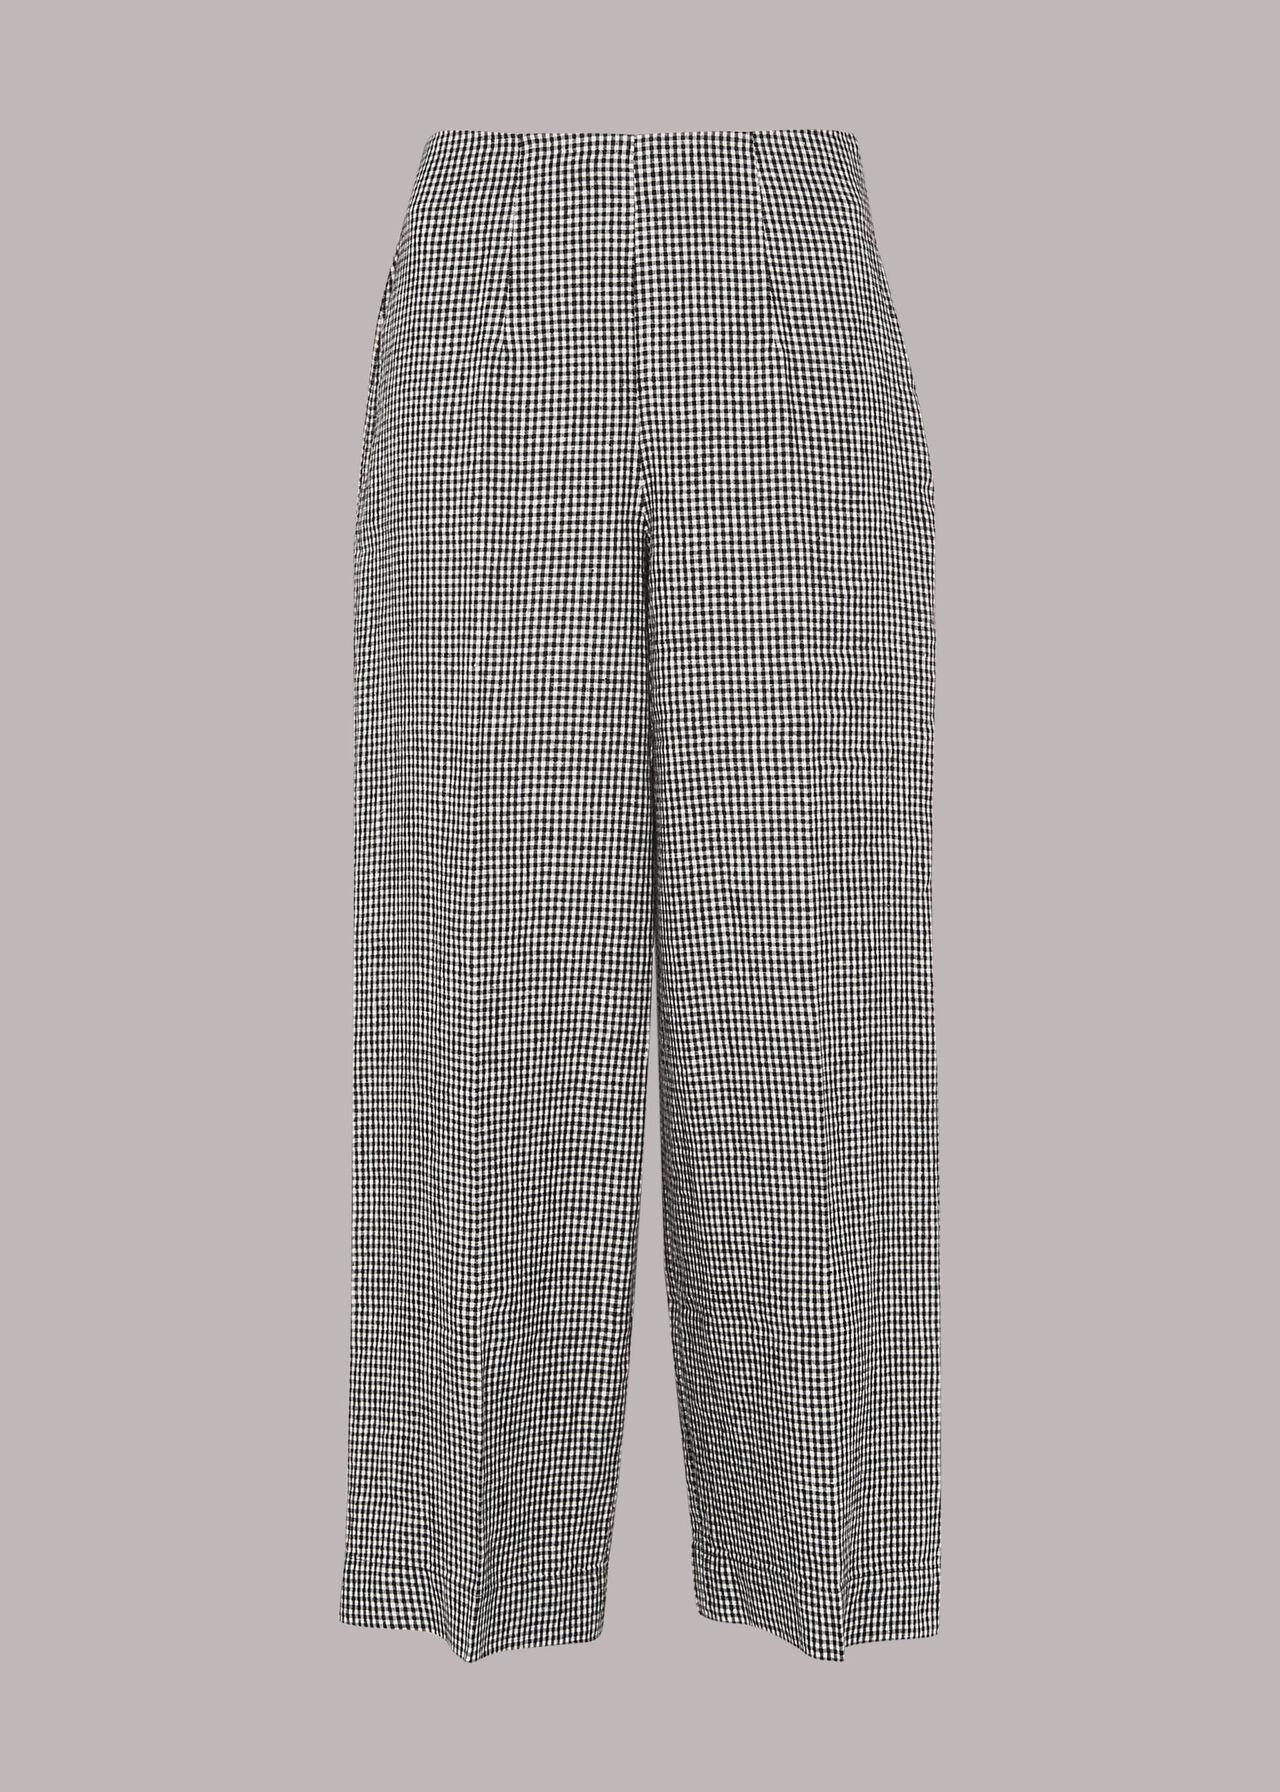 Checked Linen Crop Trouser